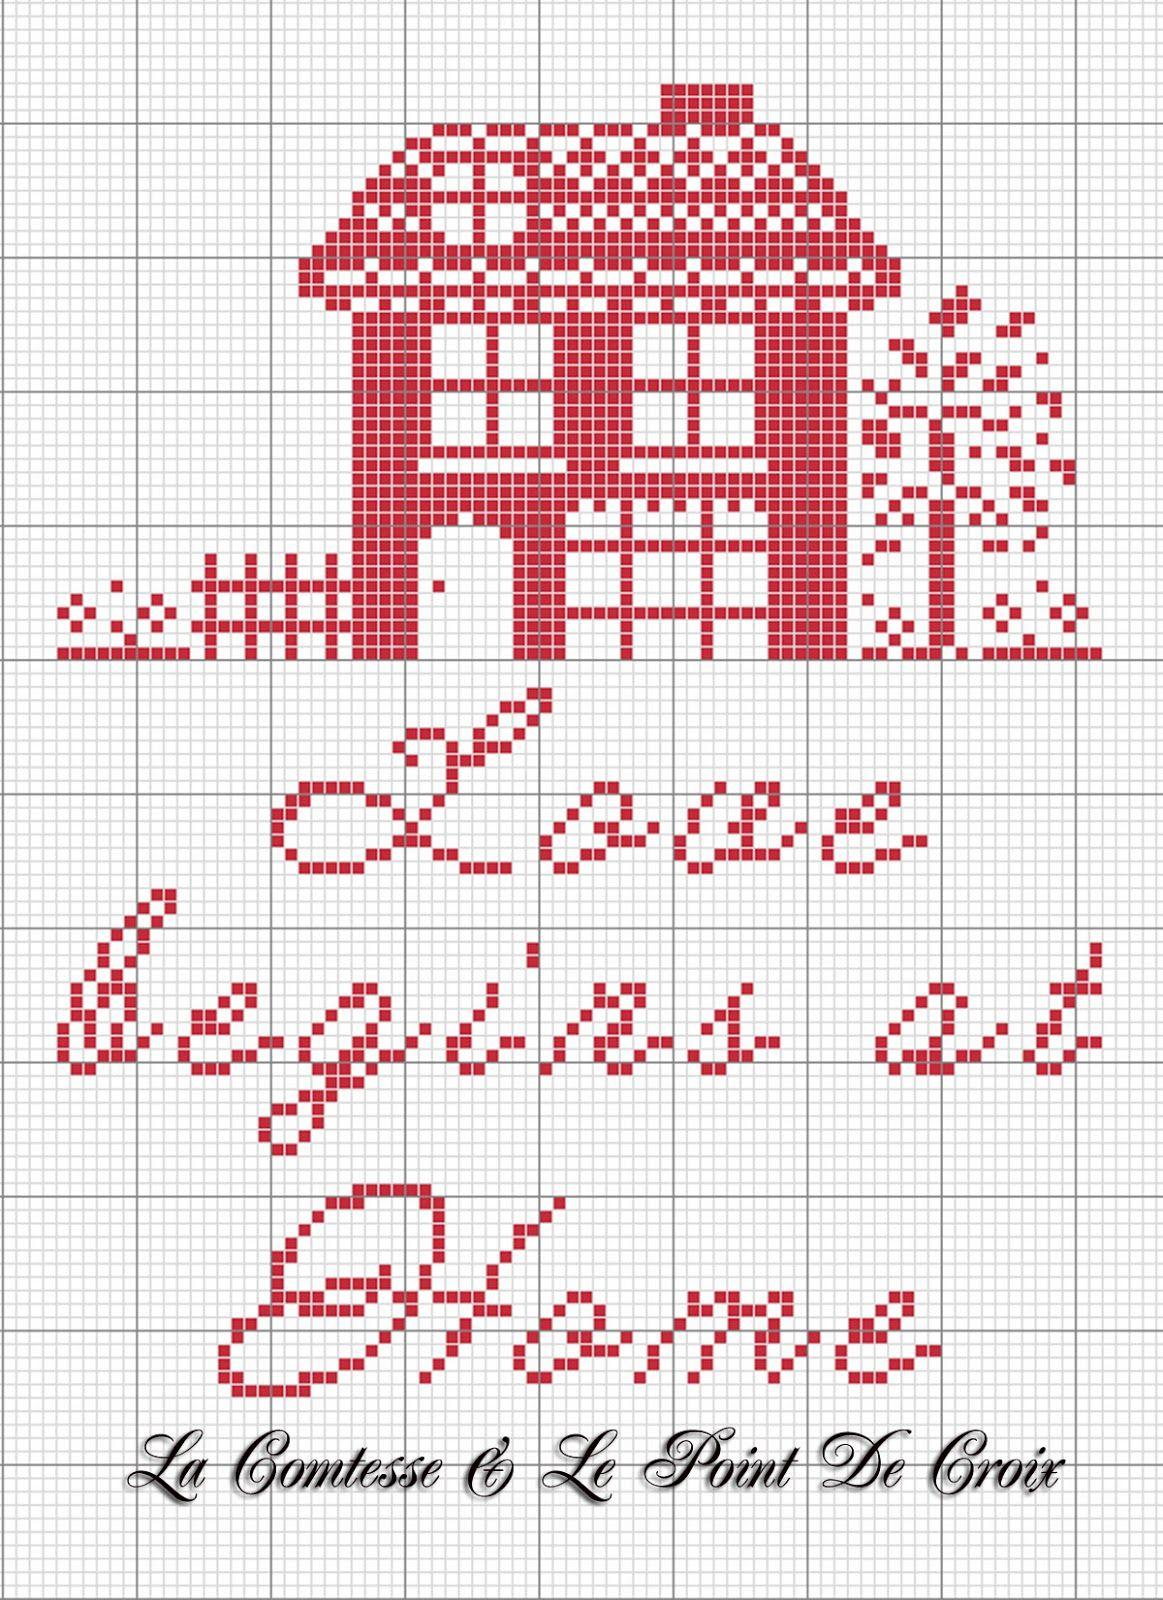 Lacomtesse&lepointdecroix: Love begins at home | bordado | Pinterest ...